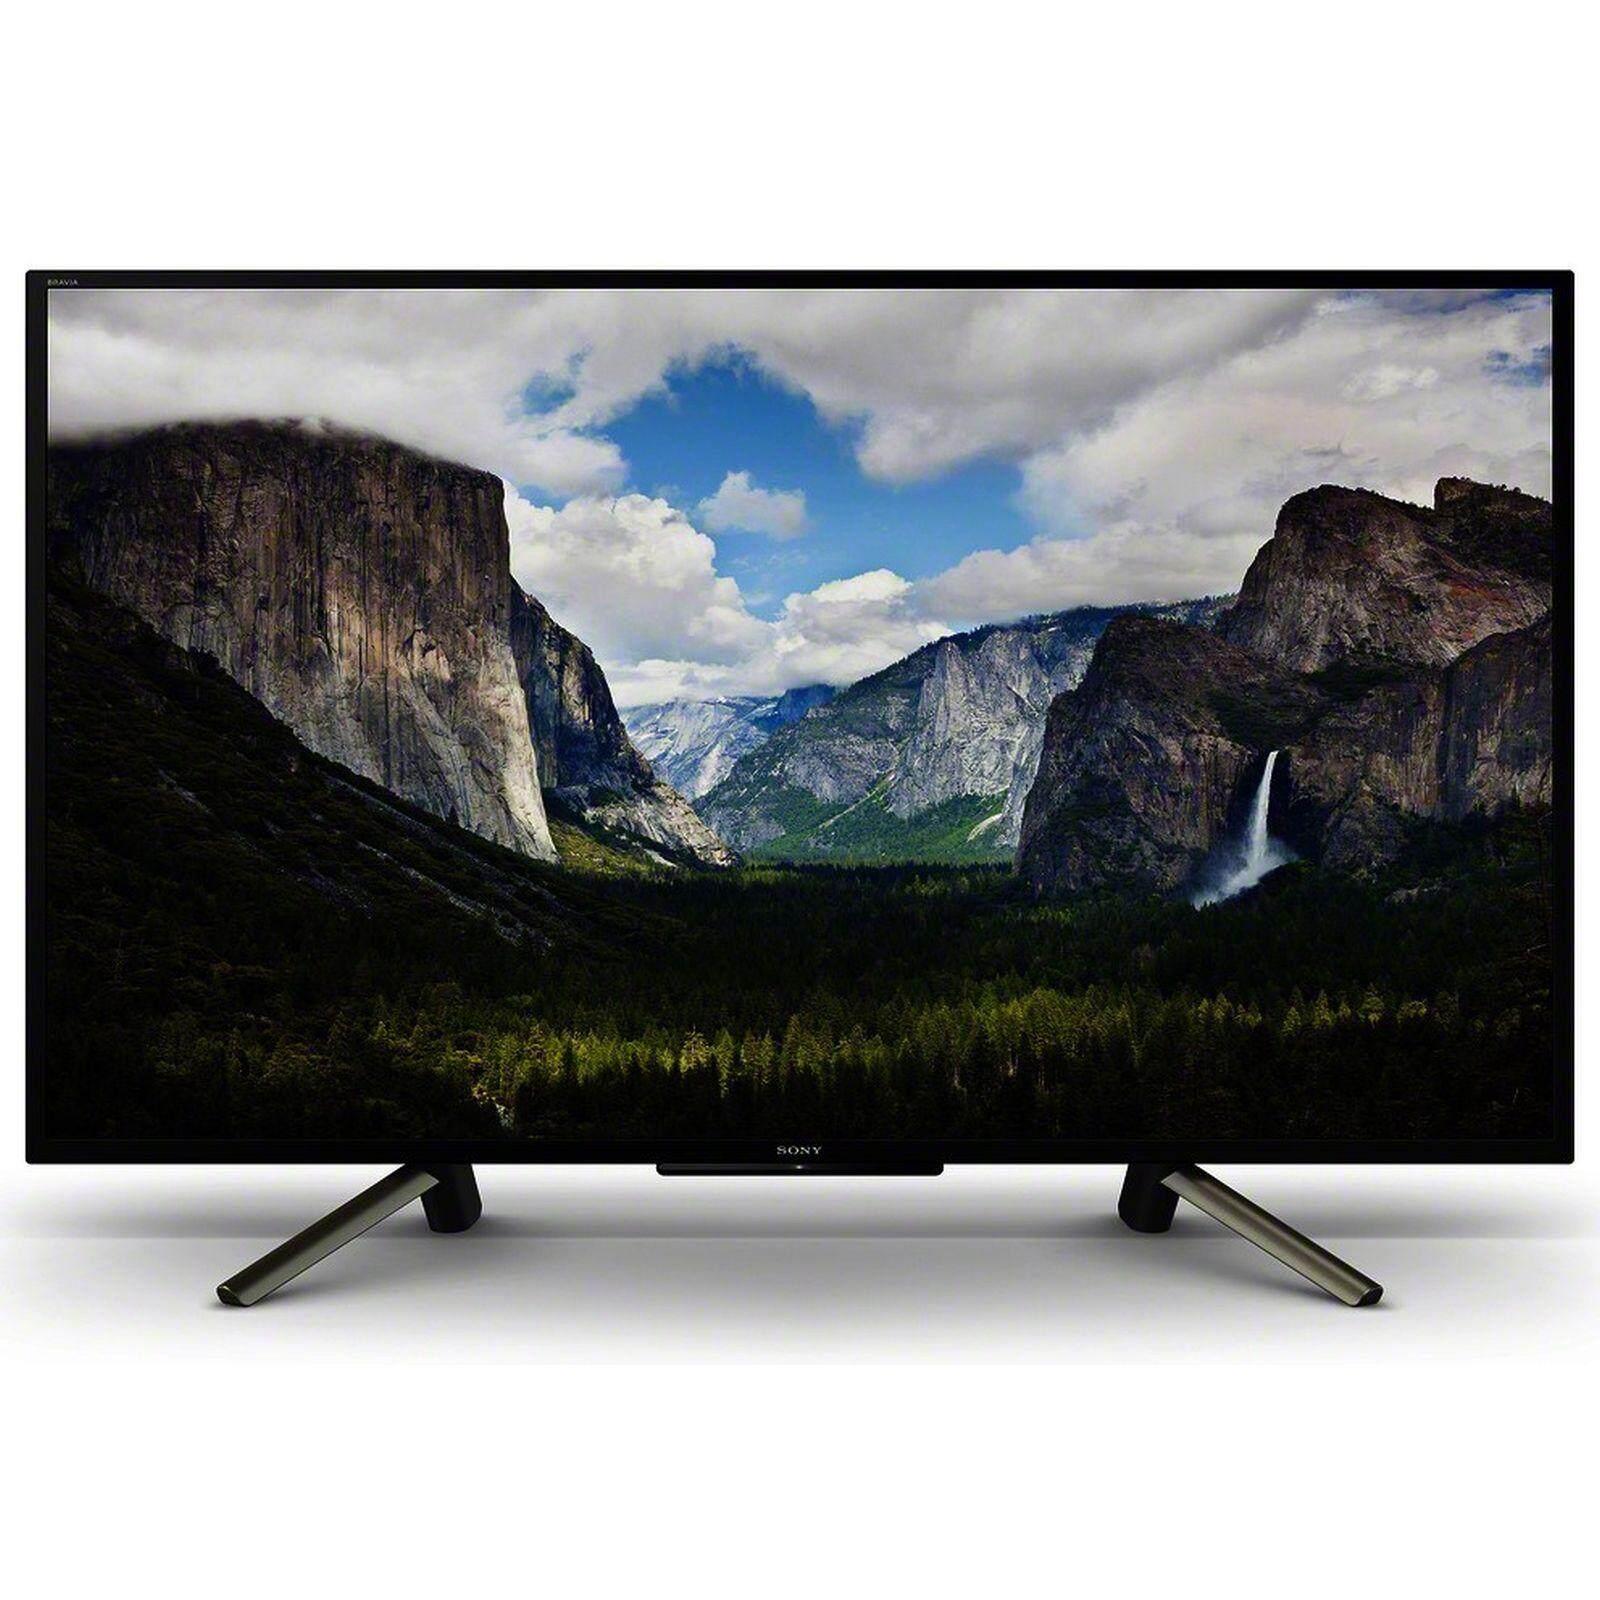 plasma tv malaysia get the best price for plasma tv at lazada malaysia